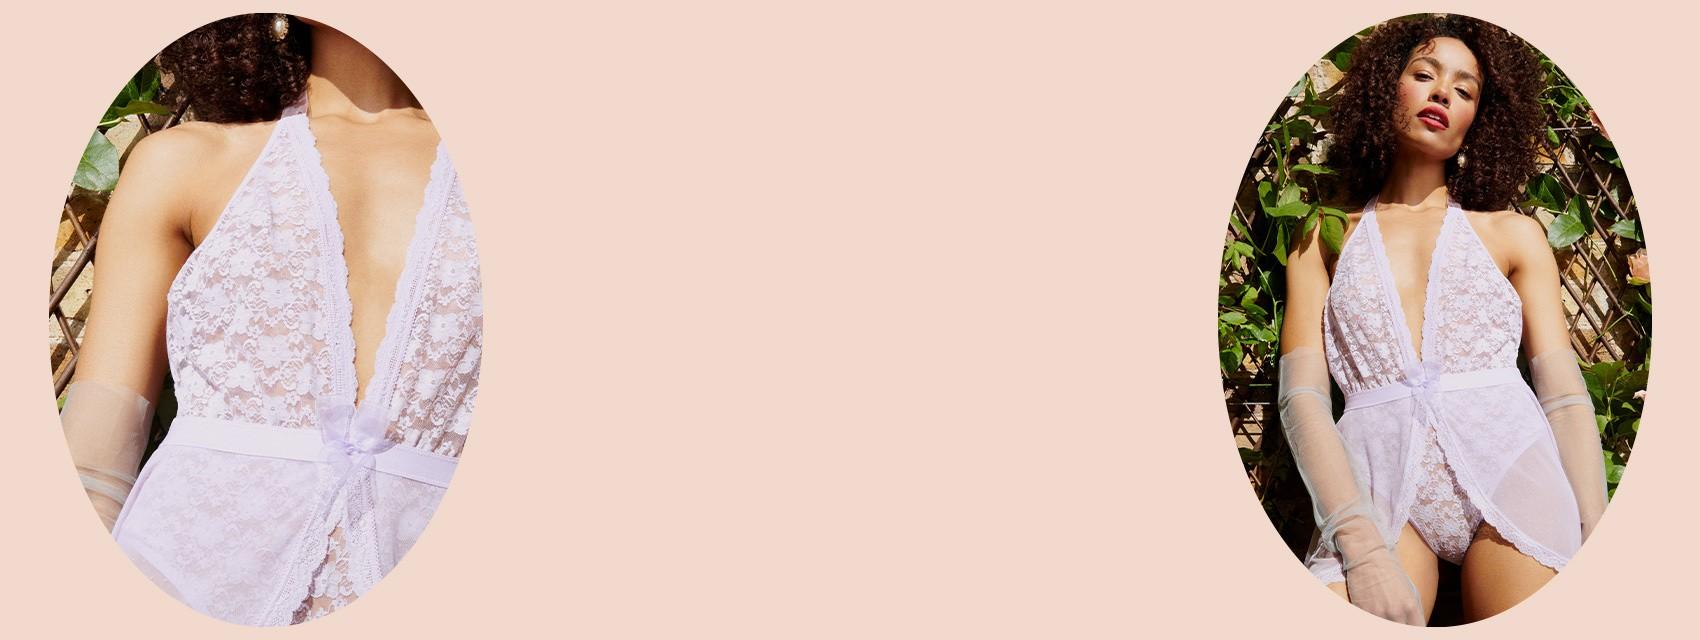 Desktop-Wild-Anticipation-Peony-lilac_1